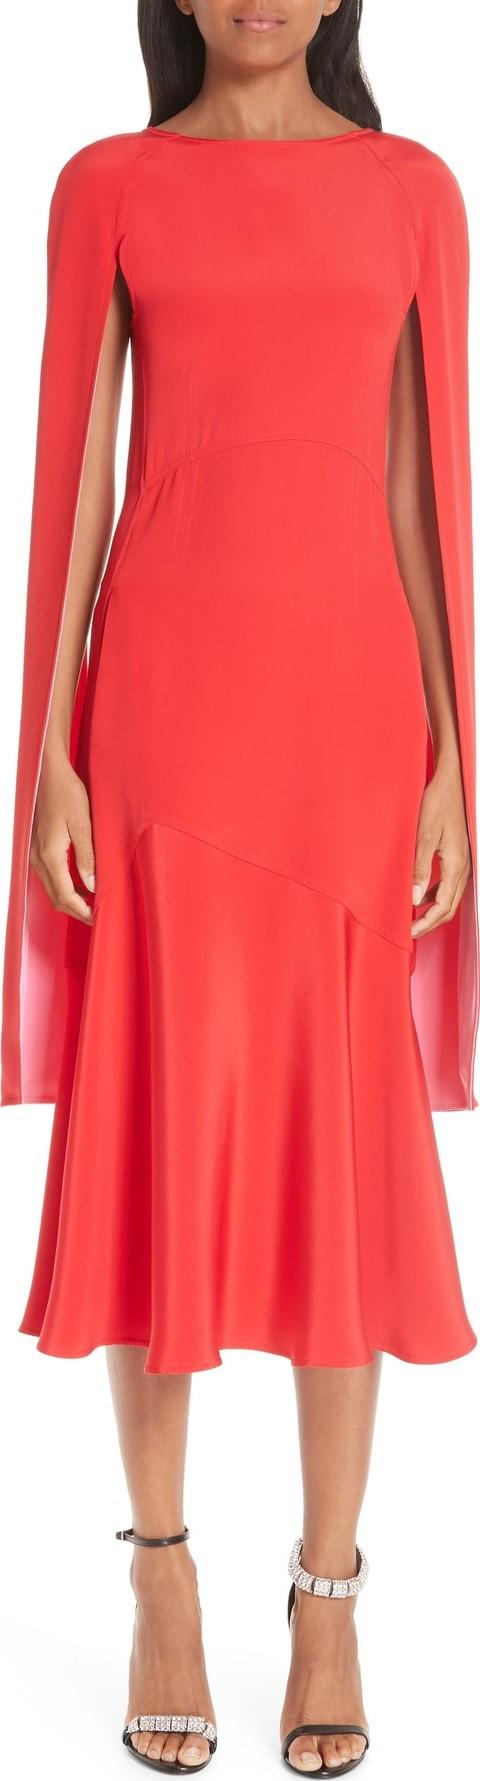 499d9726c8 Calvin Klein 205W39NYC Cape Sleeve Silk Cady Midi Dress - Mkt